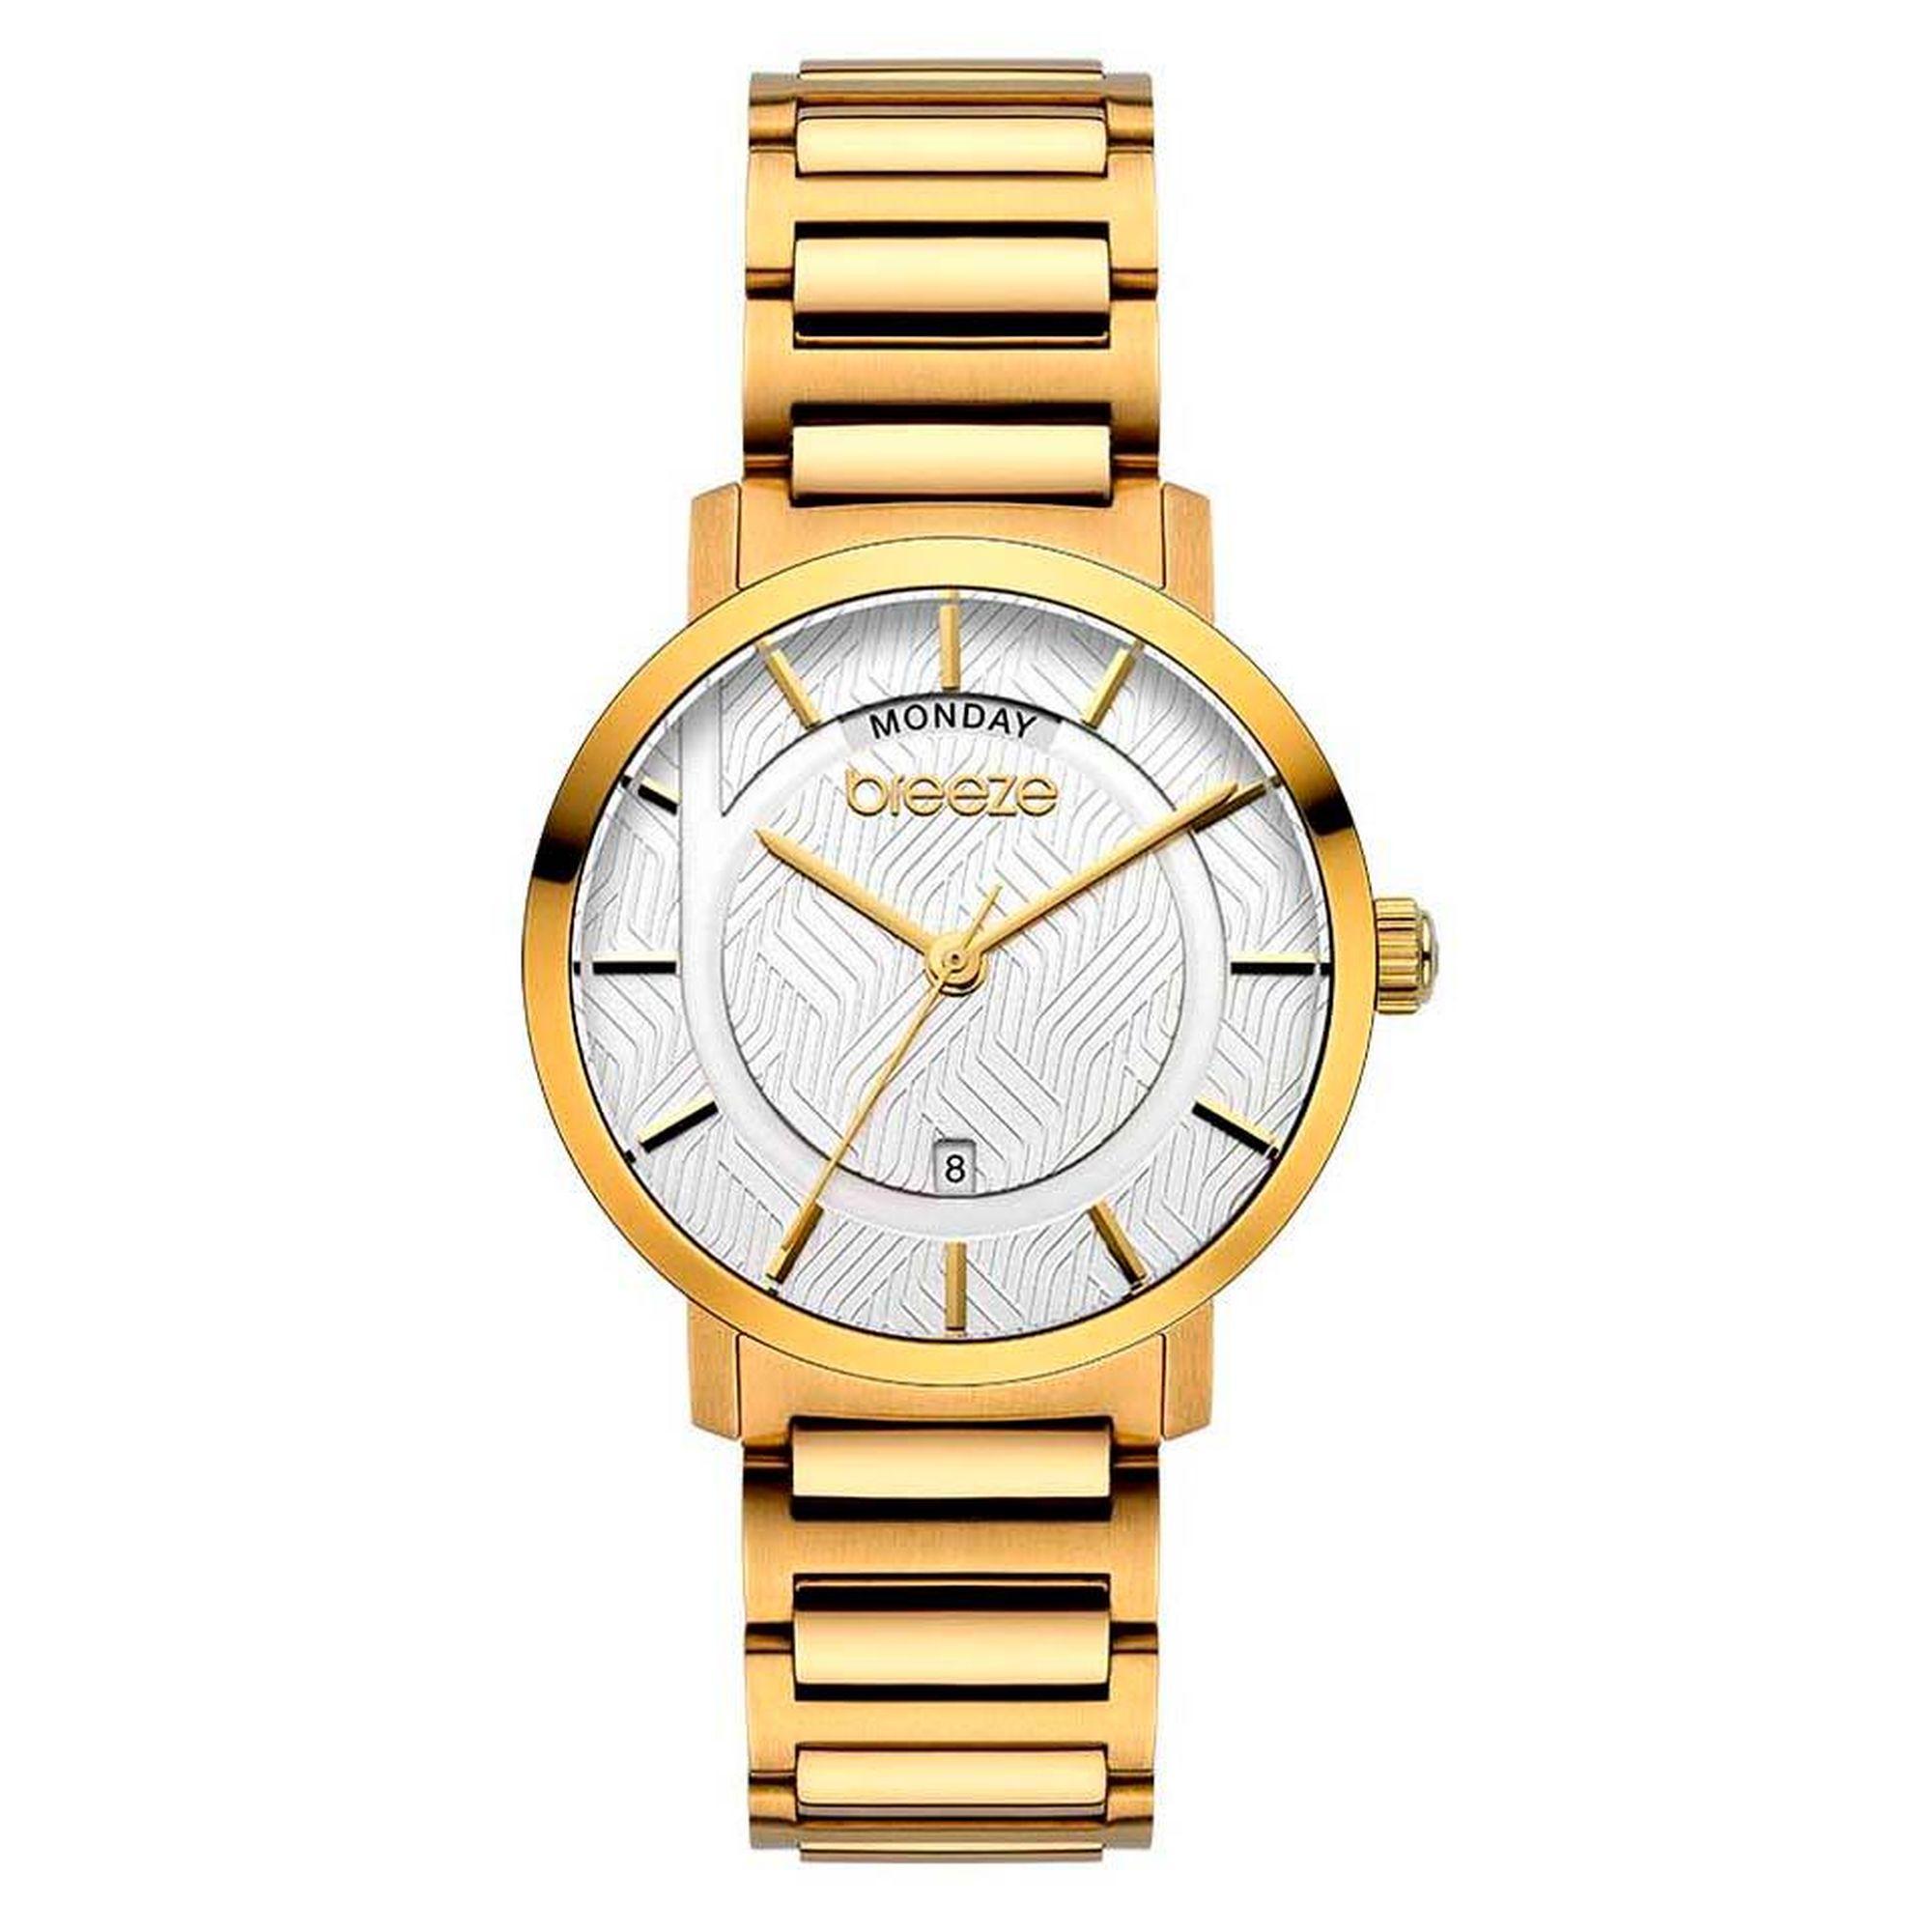 Breeze Superfect Gold 212081.2, breeze, ρολόγια Breeze, γυναικεία ρολόγια, Δωρεάν μεταφορικά, Άμεση Διαθεσιμότητα